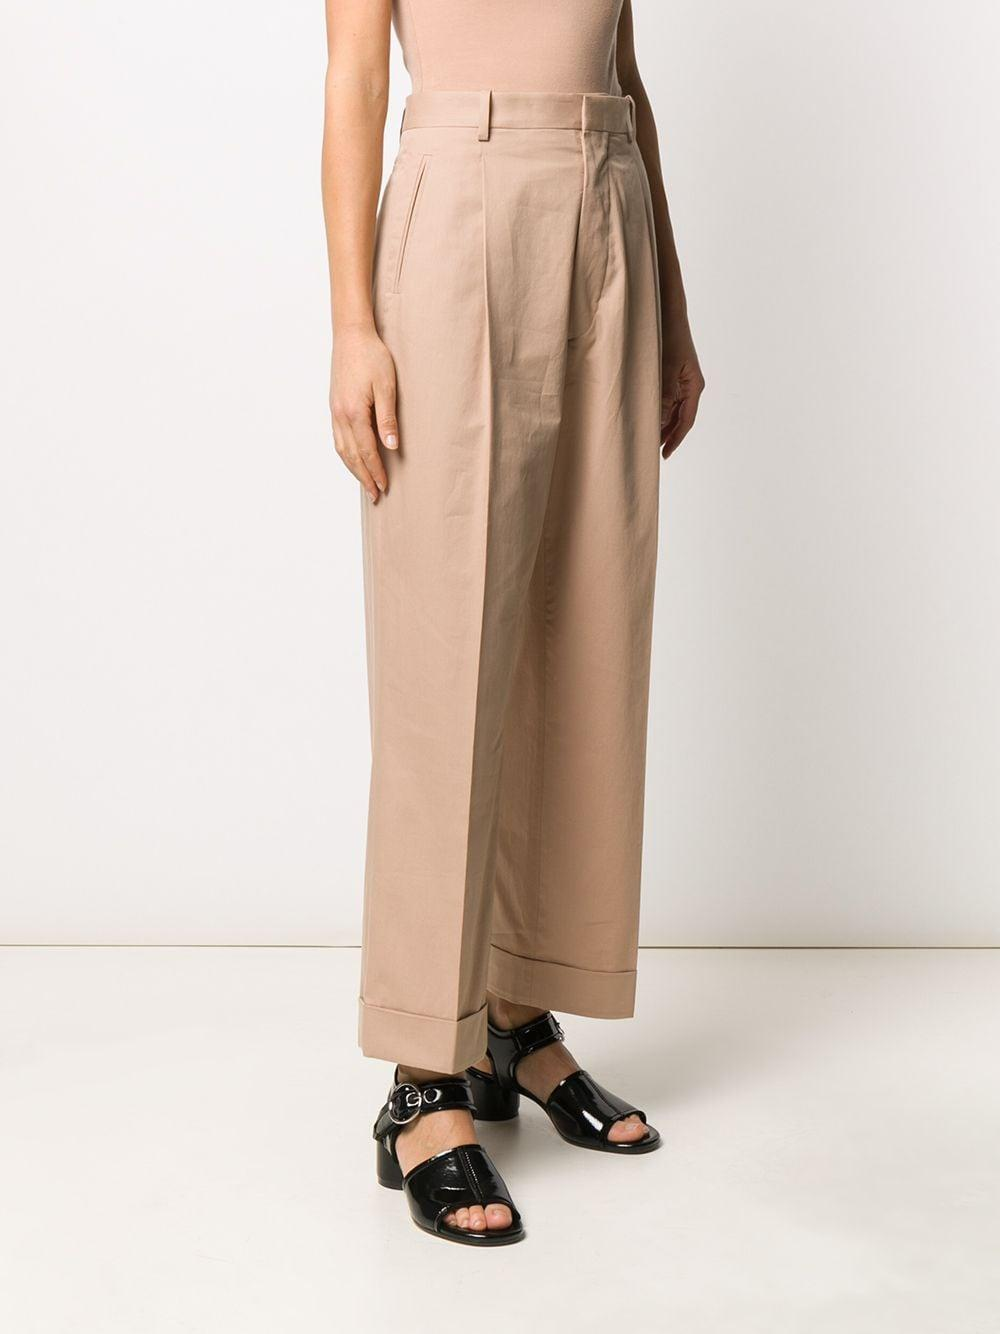 Pantalones capri de talle alto Maison Margiela de Algodón de color Neutro